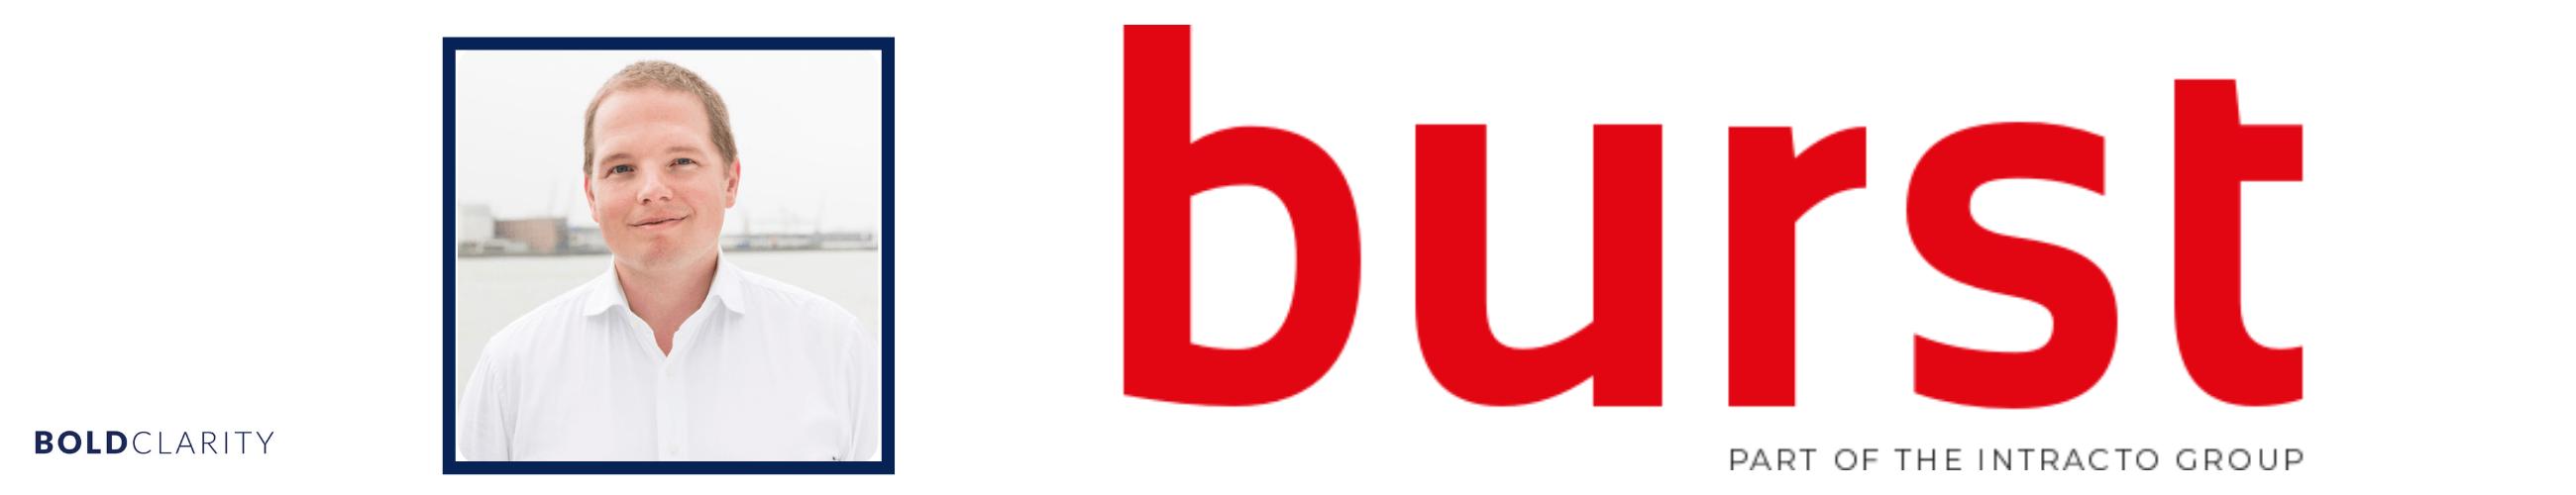 Burst Digital EOS Case study